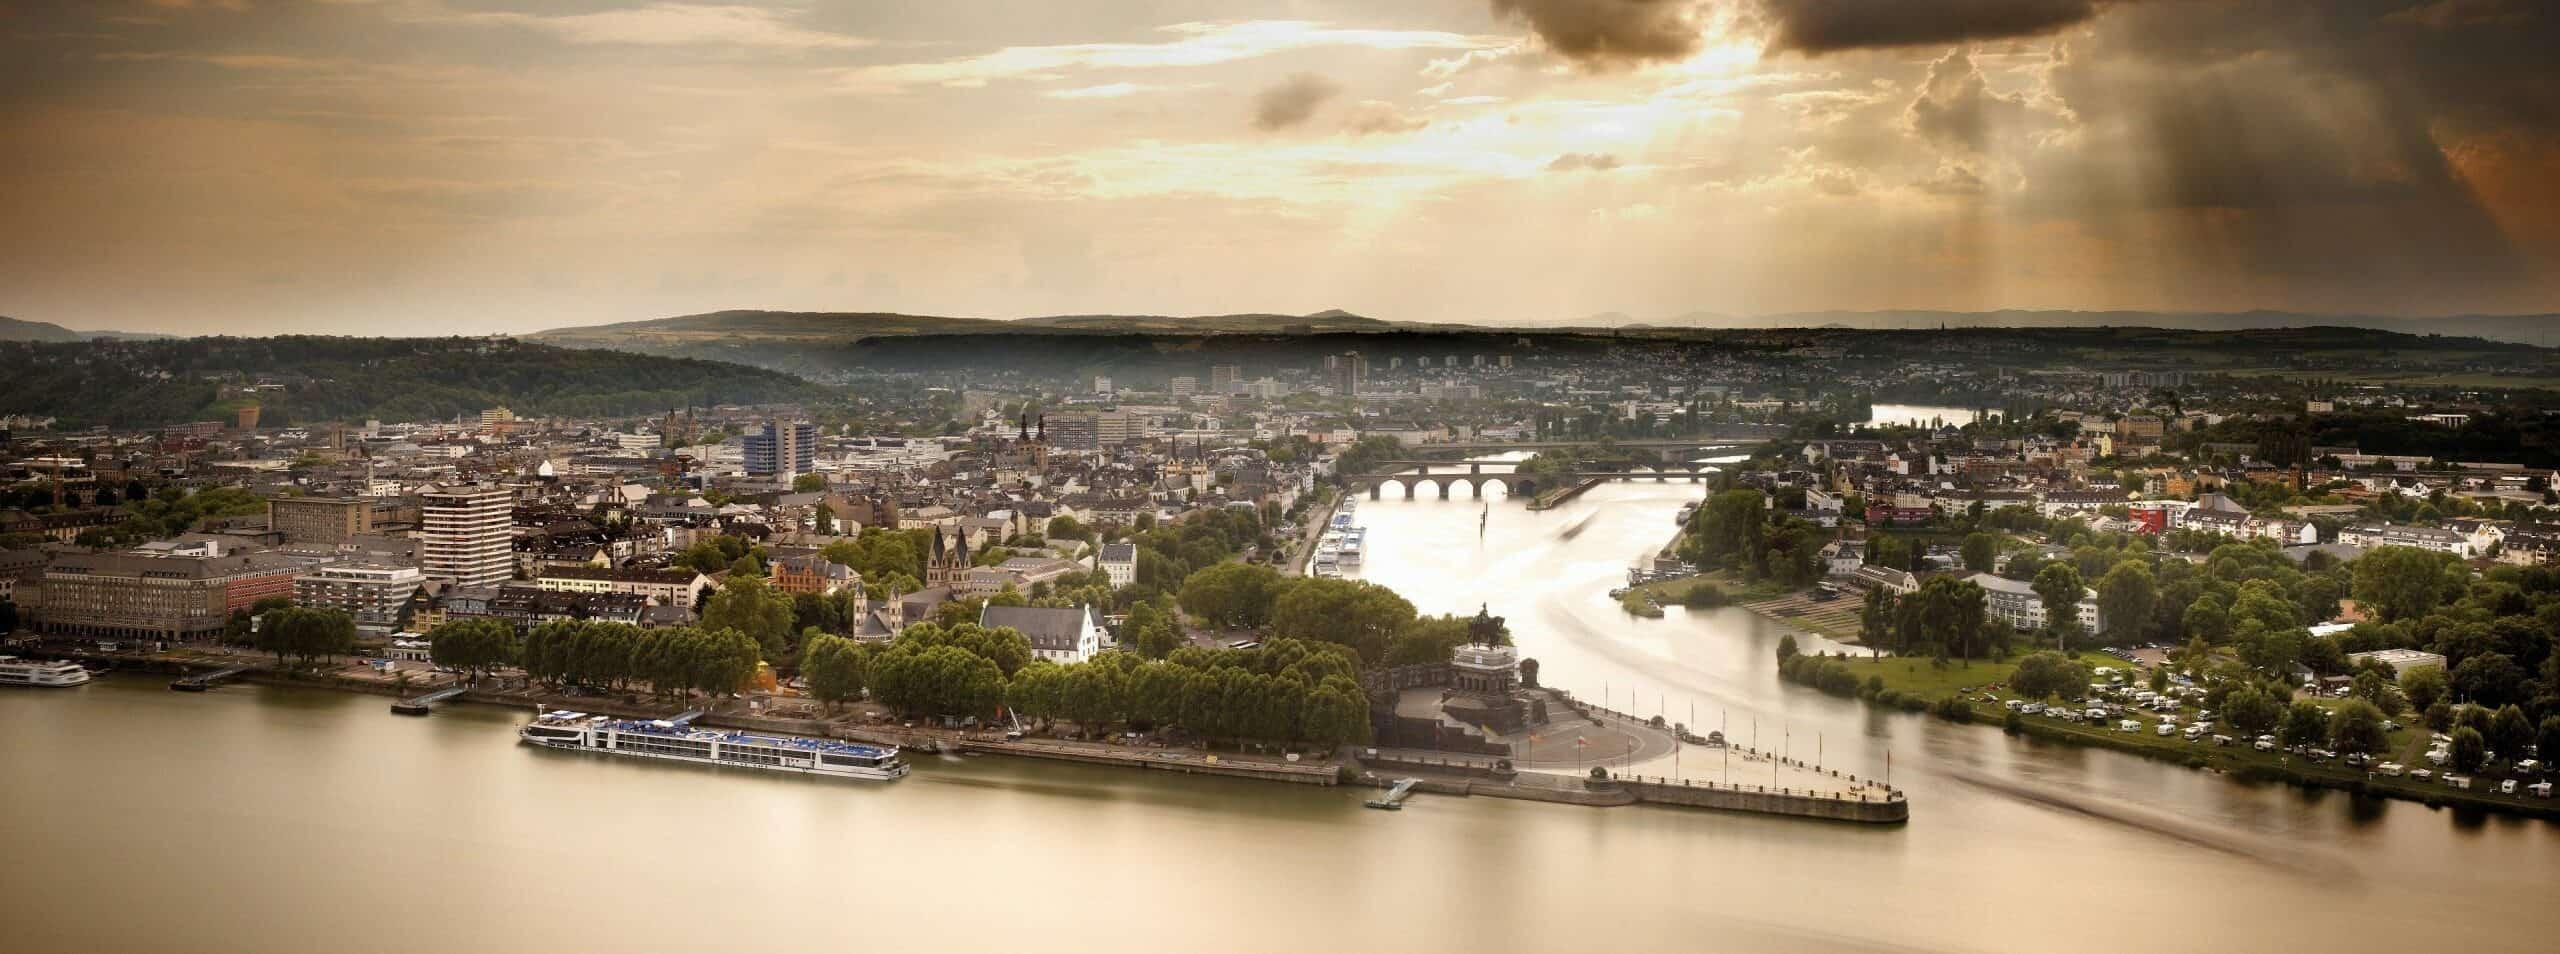 Personalberatung Koblenz